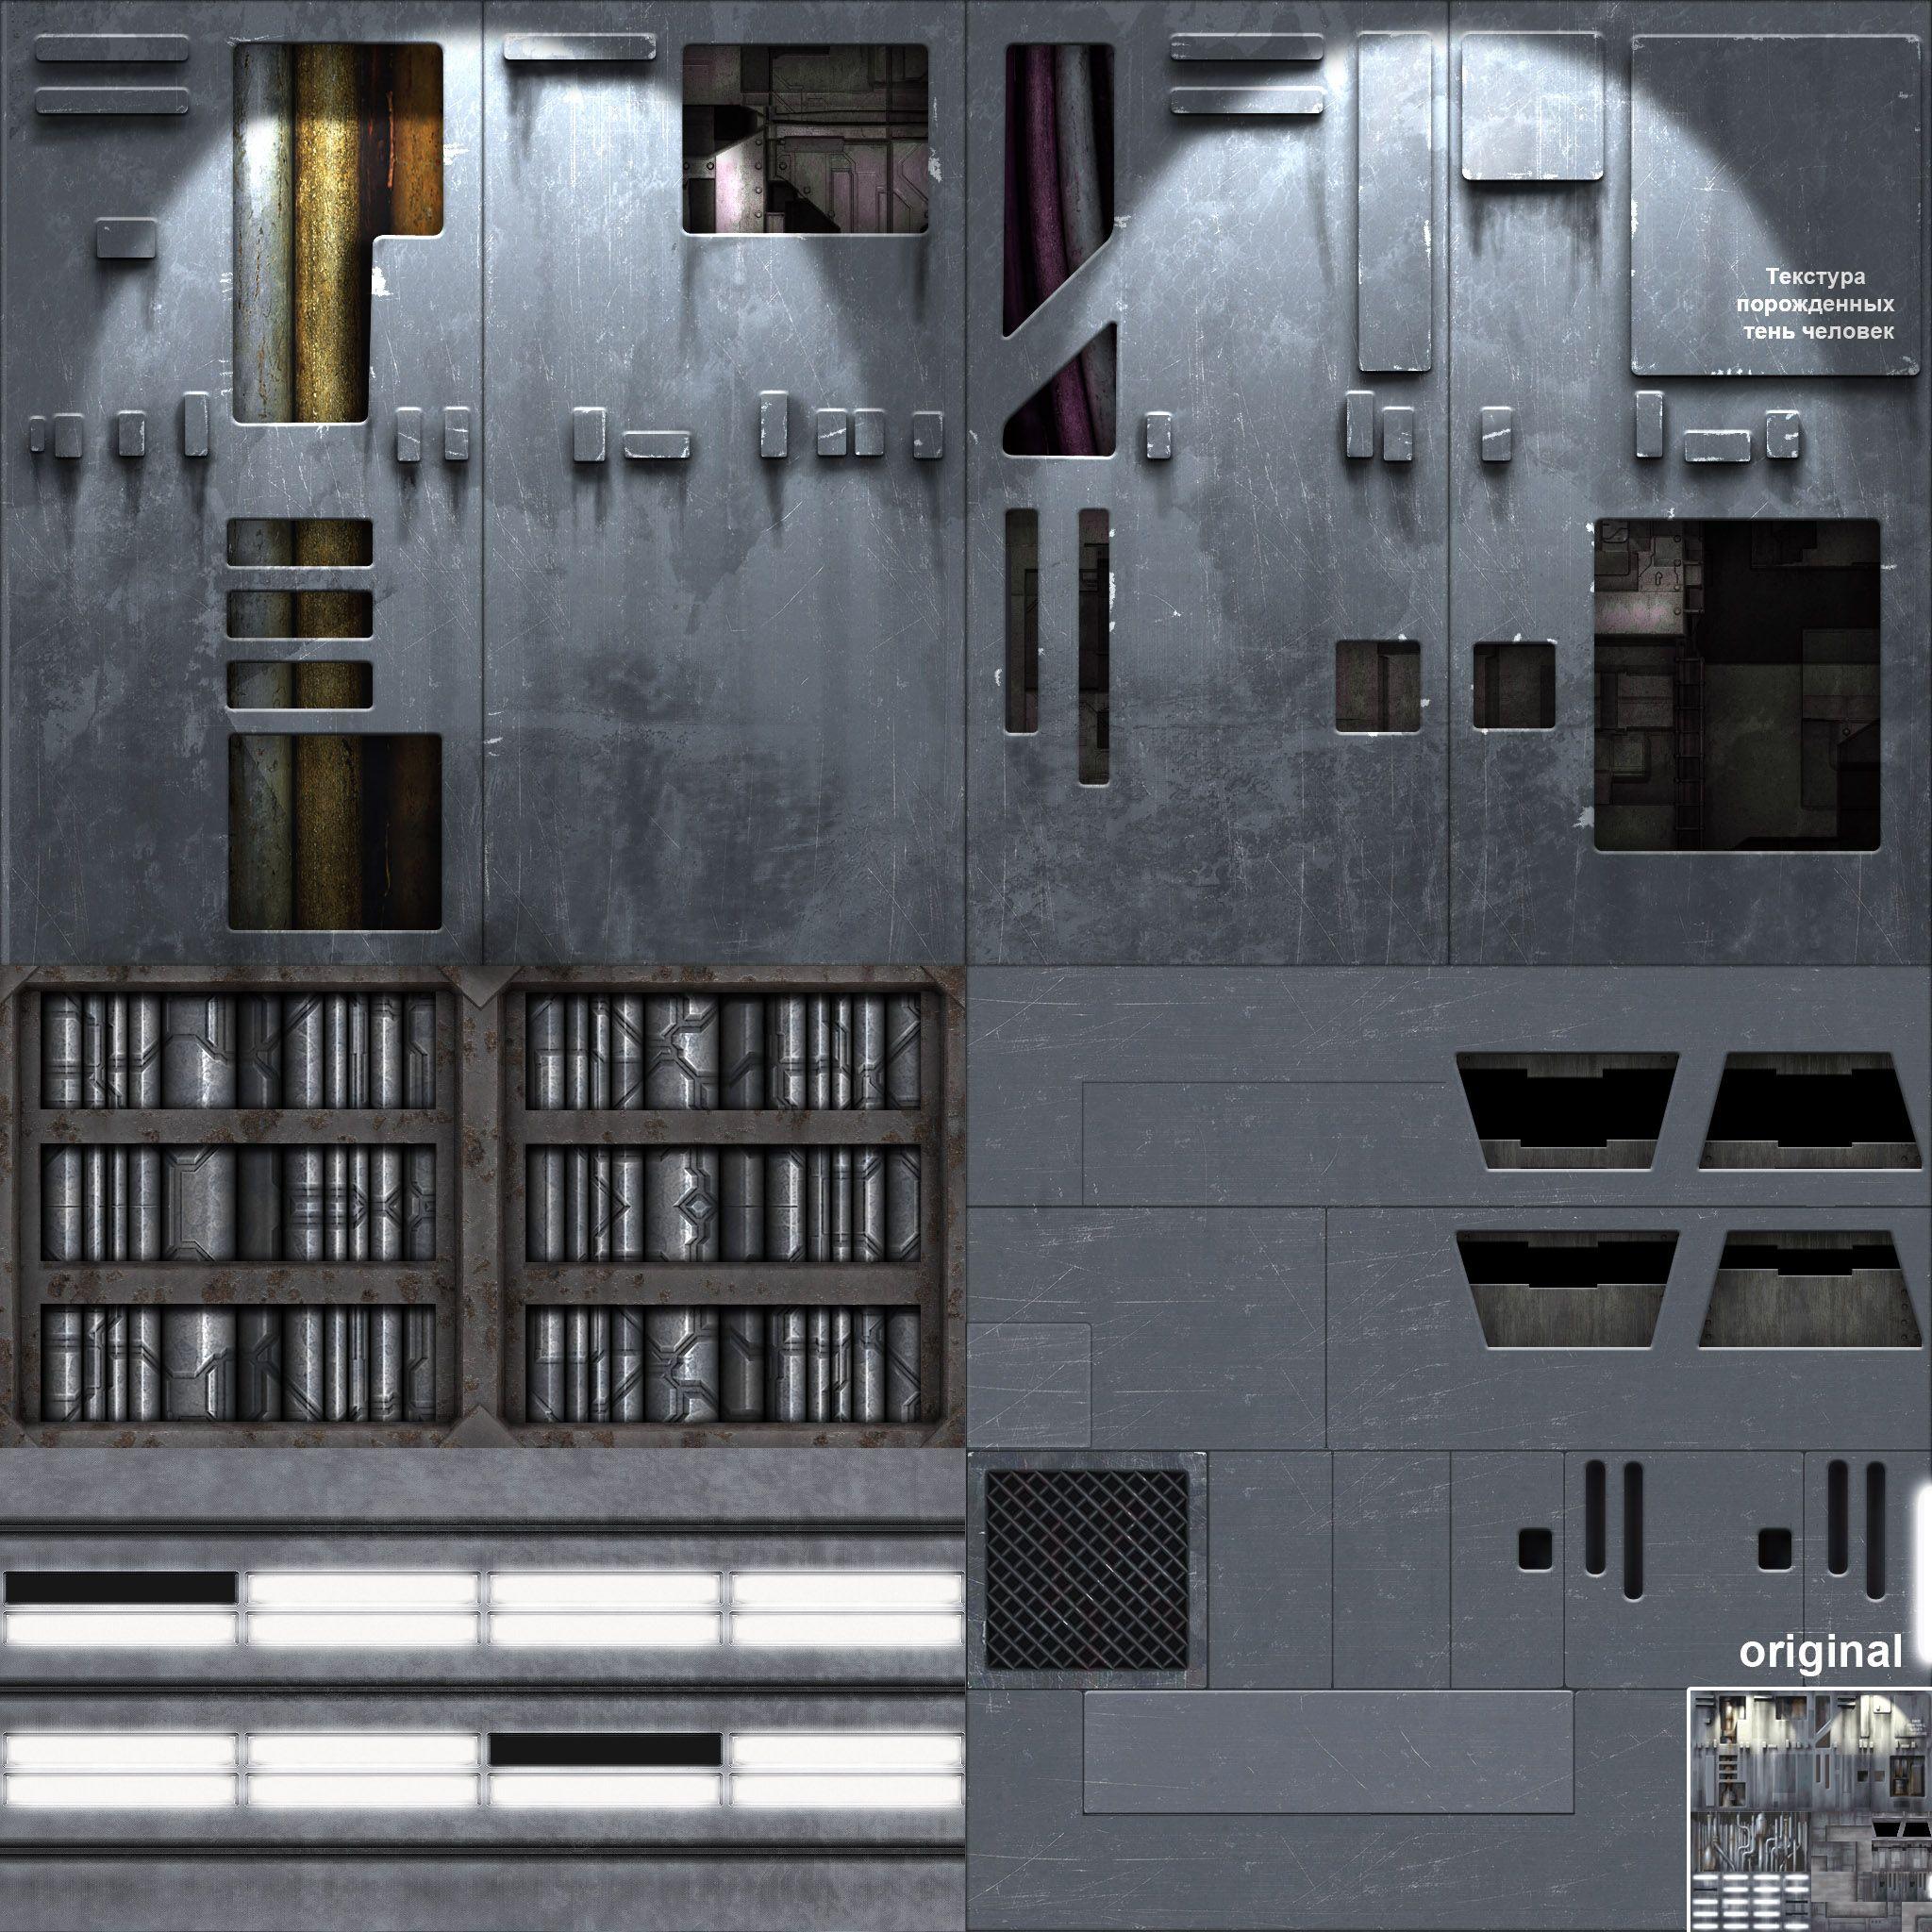 Spaceship Textures Google Search Texture Inspiration